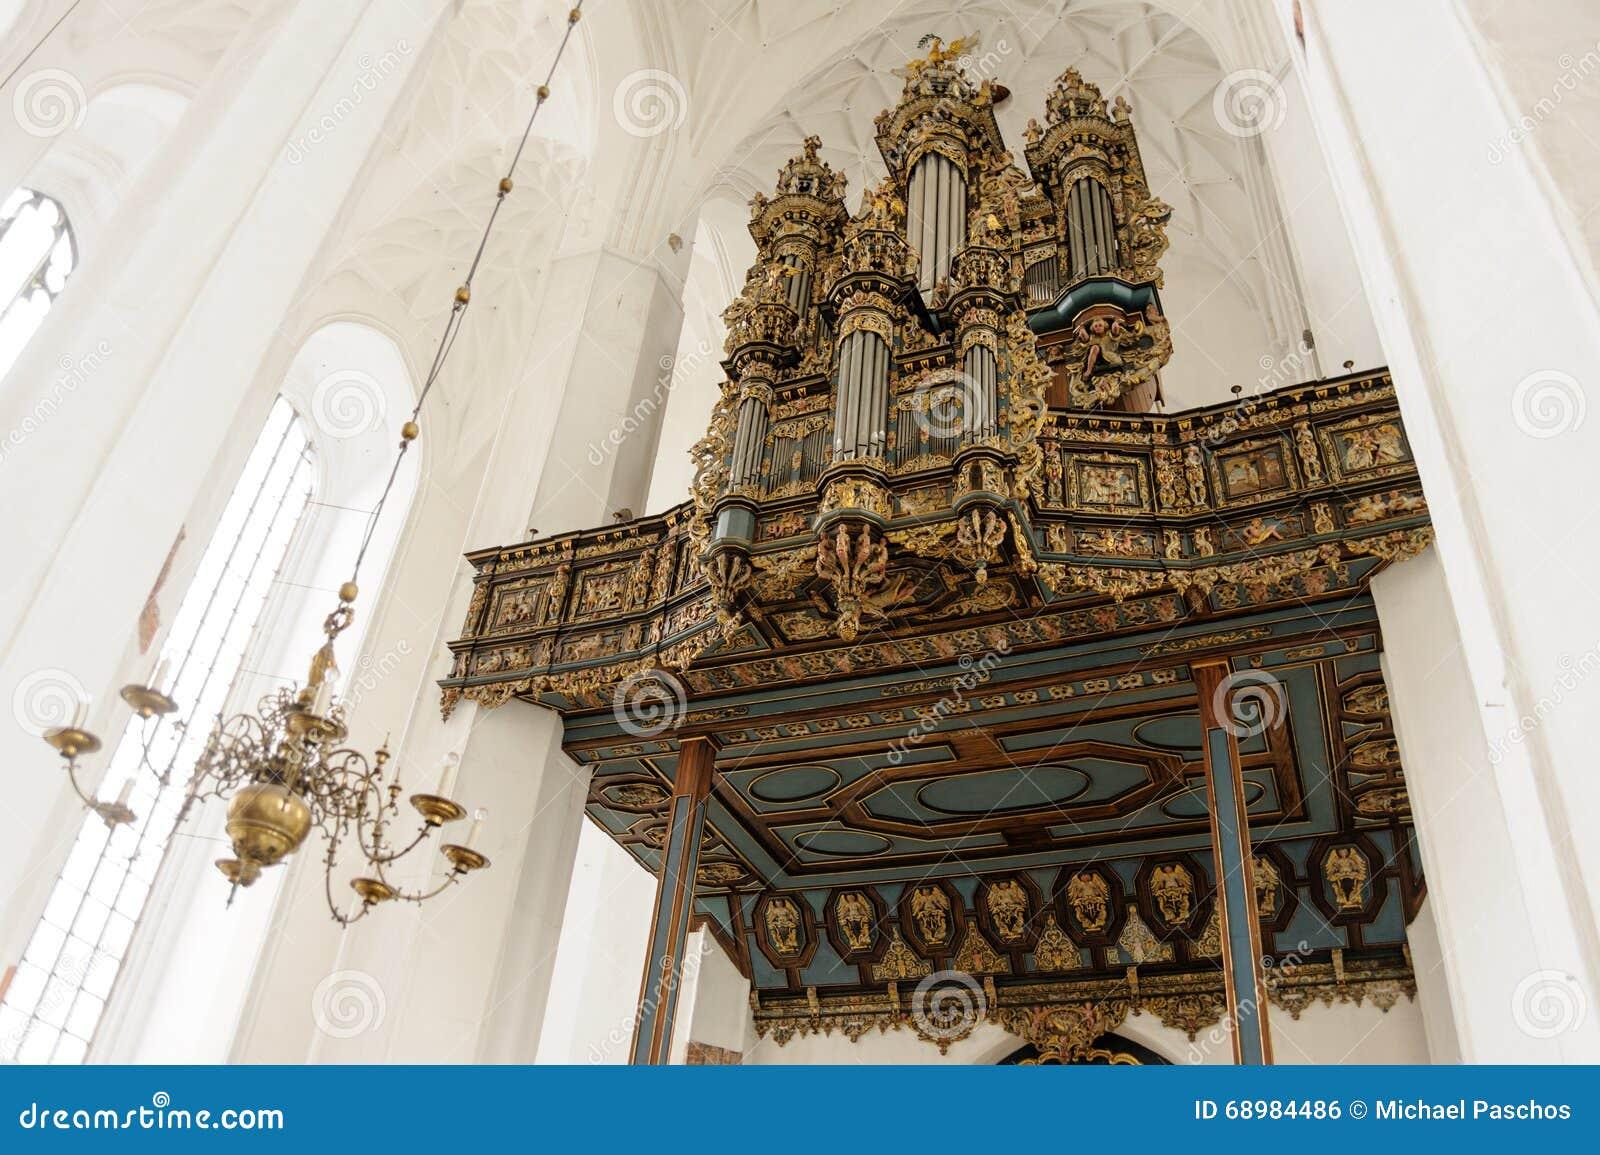 Órgano de Merten Friese